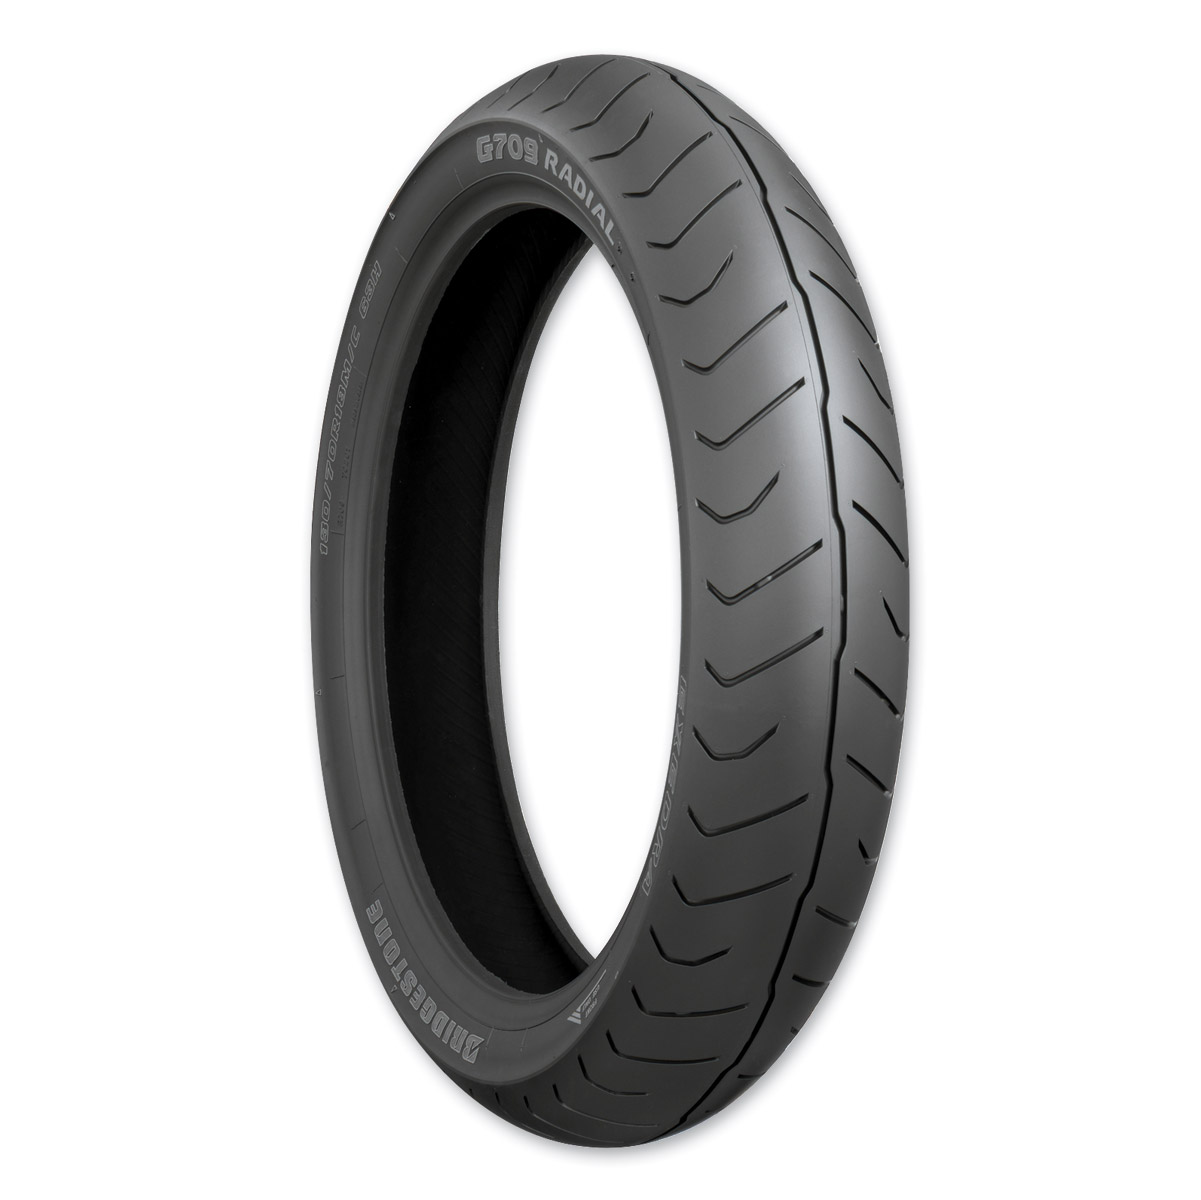 Bridgestone Motorcycle Tires   J&P Cycles